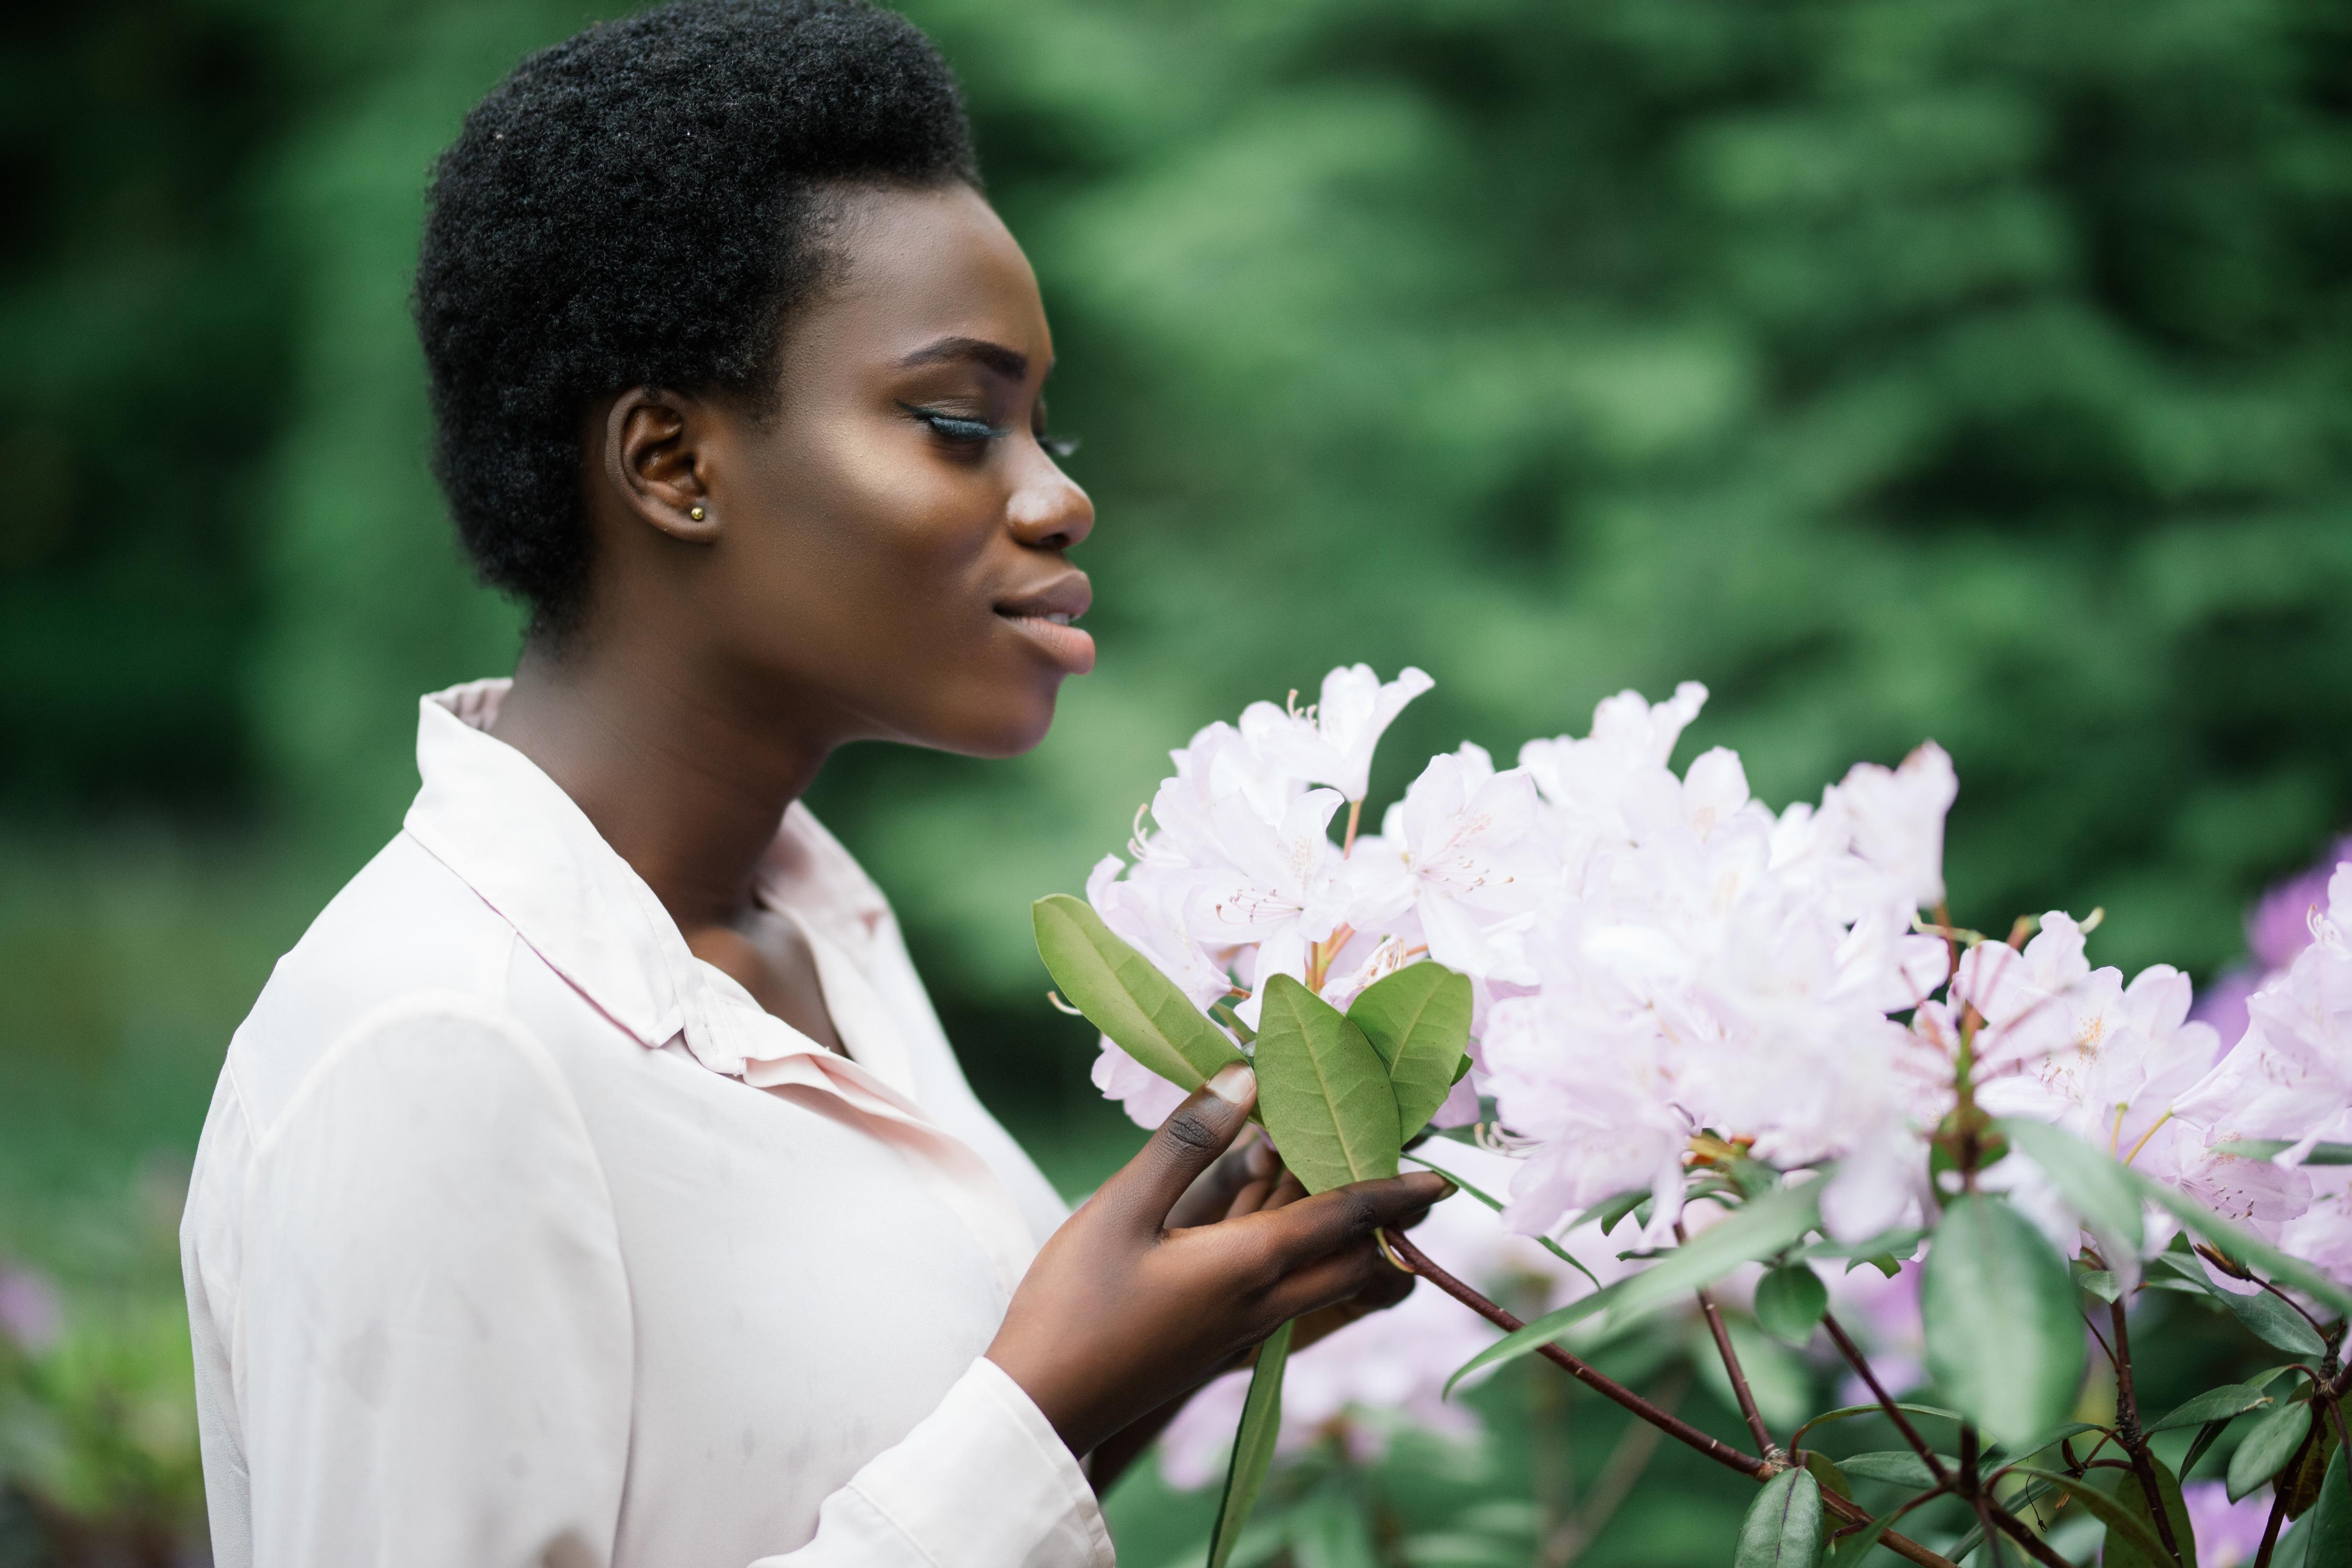 woman examining a flower